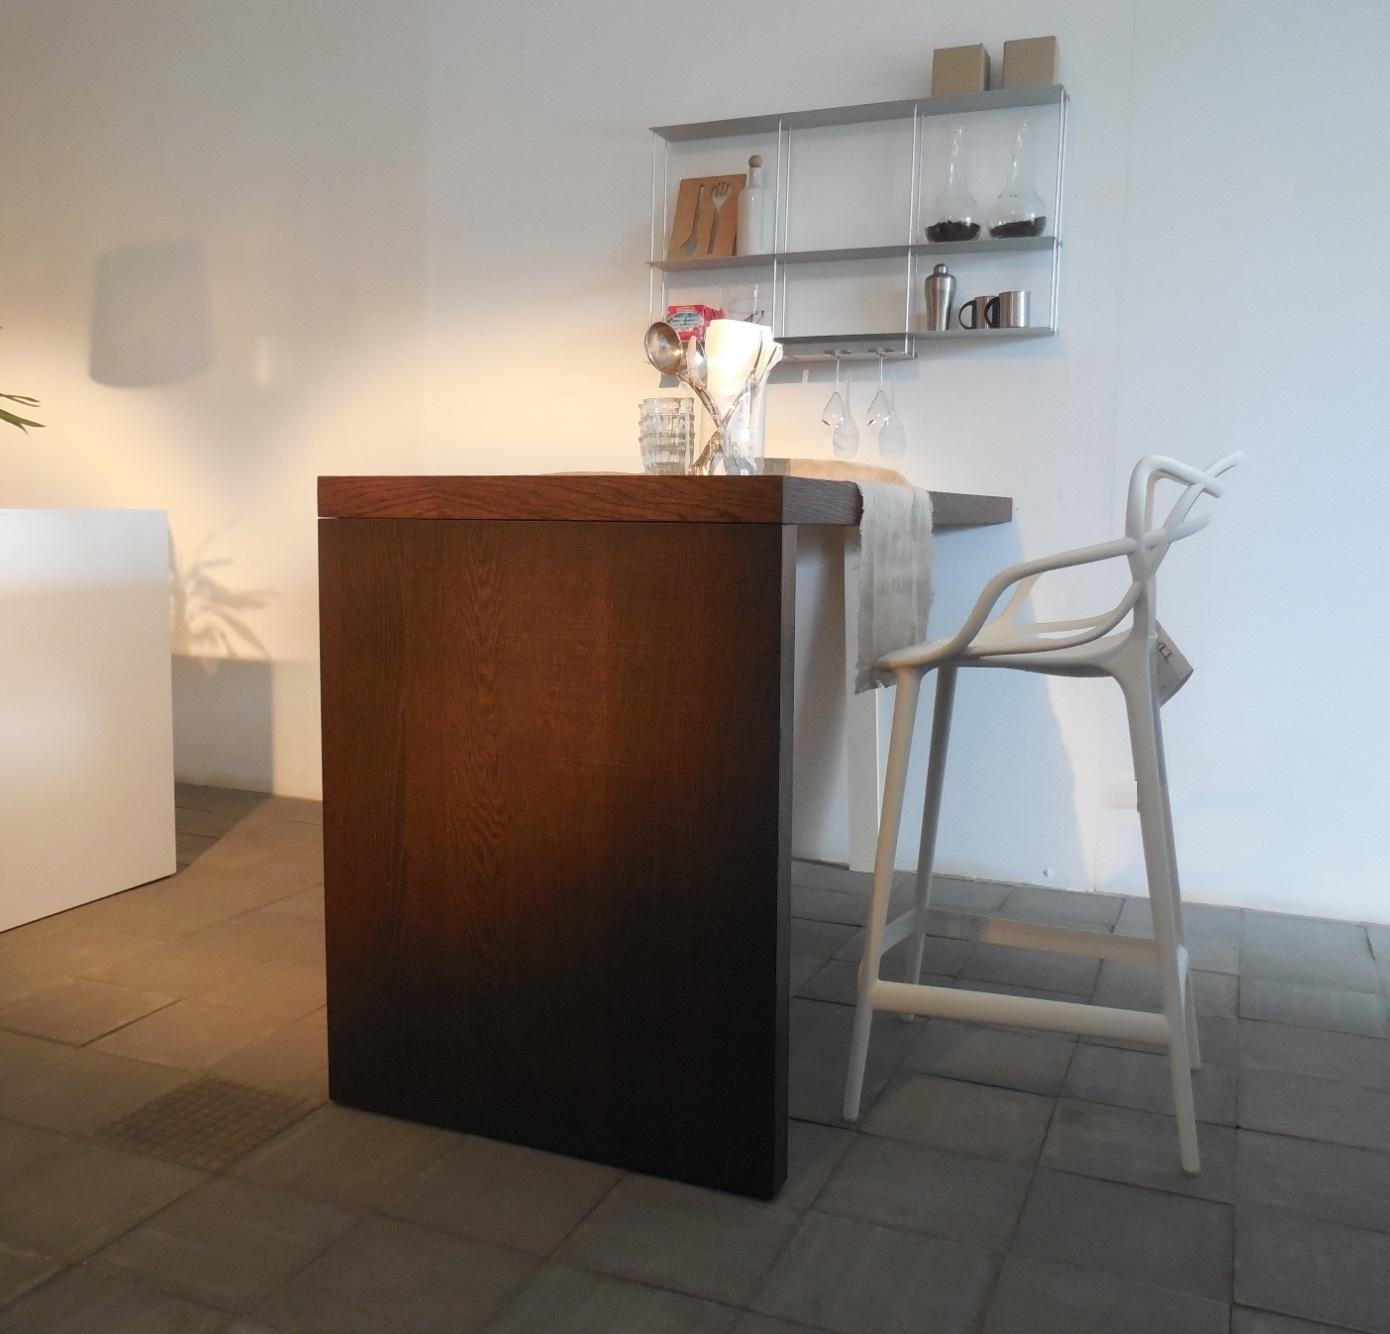 Bancone in legno per cucina design casa creativa e - Legno per cucine ...